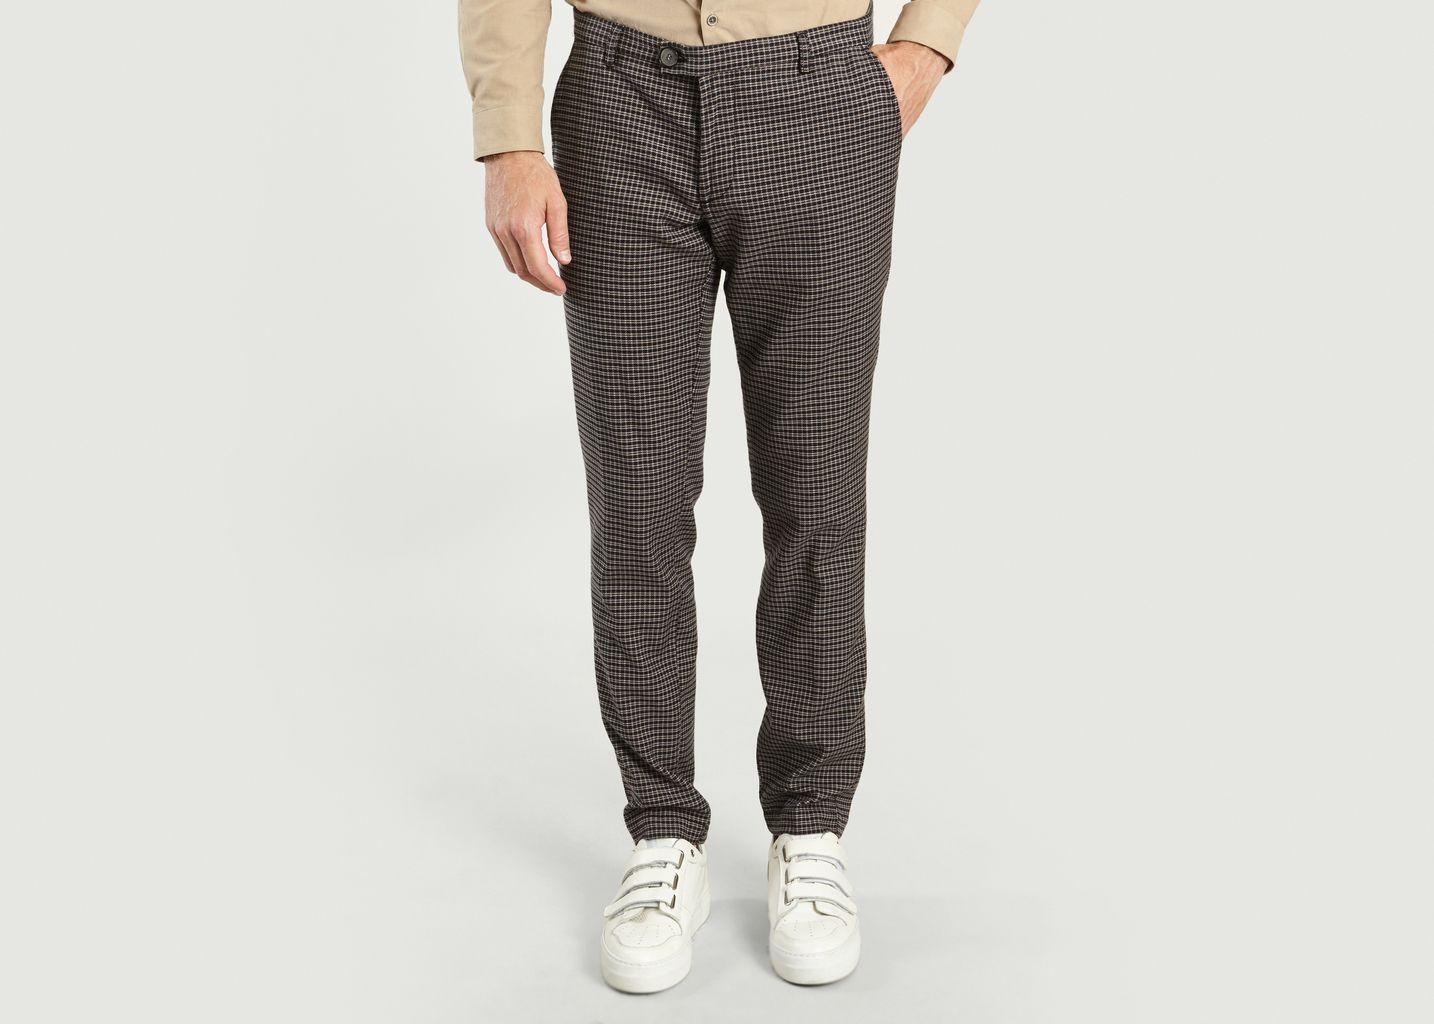 Pantalon Carreaux City 2 - JagVi